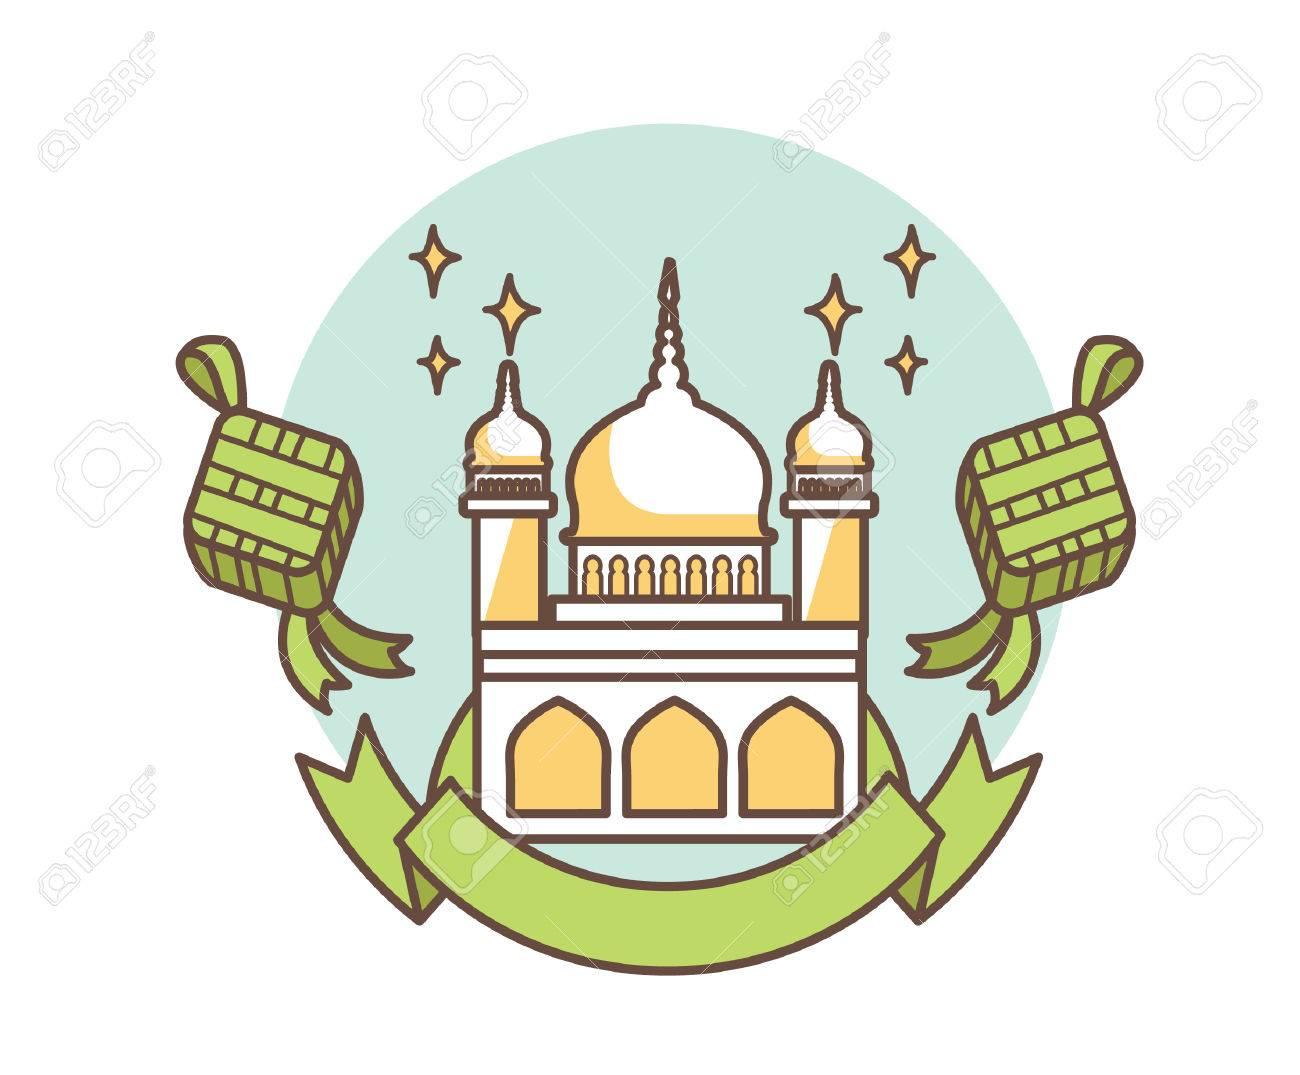 Selamat Hari Raya Aidilfitri With Mosque Building And Ketupat Stock Vector